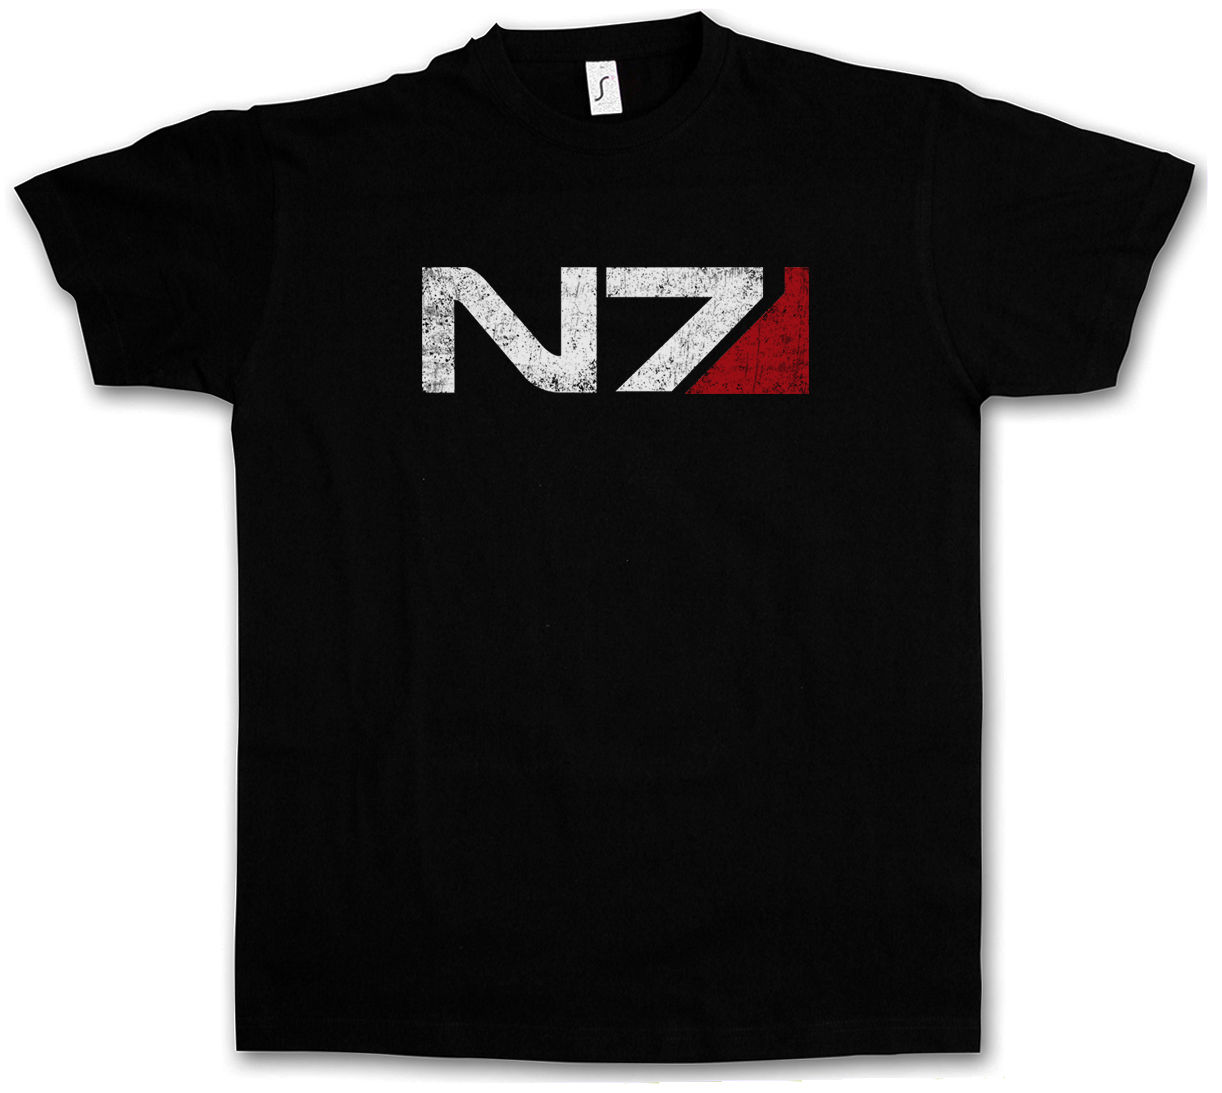 Besorgt N7 Normandie Logo T-shirt Masse Kommandant Shepard Cerberus Pc Spiel Wirkung T Hemd Kühlen Casual Stolz T Hemd Männer Unisex Mode Hochwertige Materialien